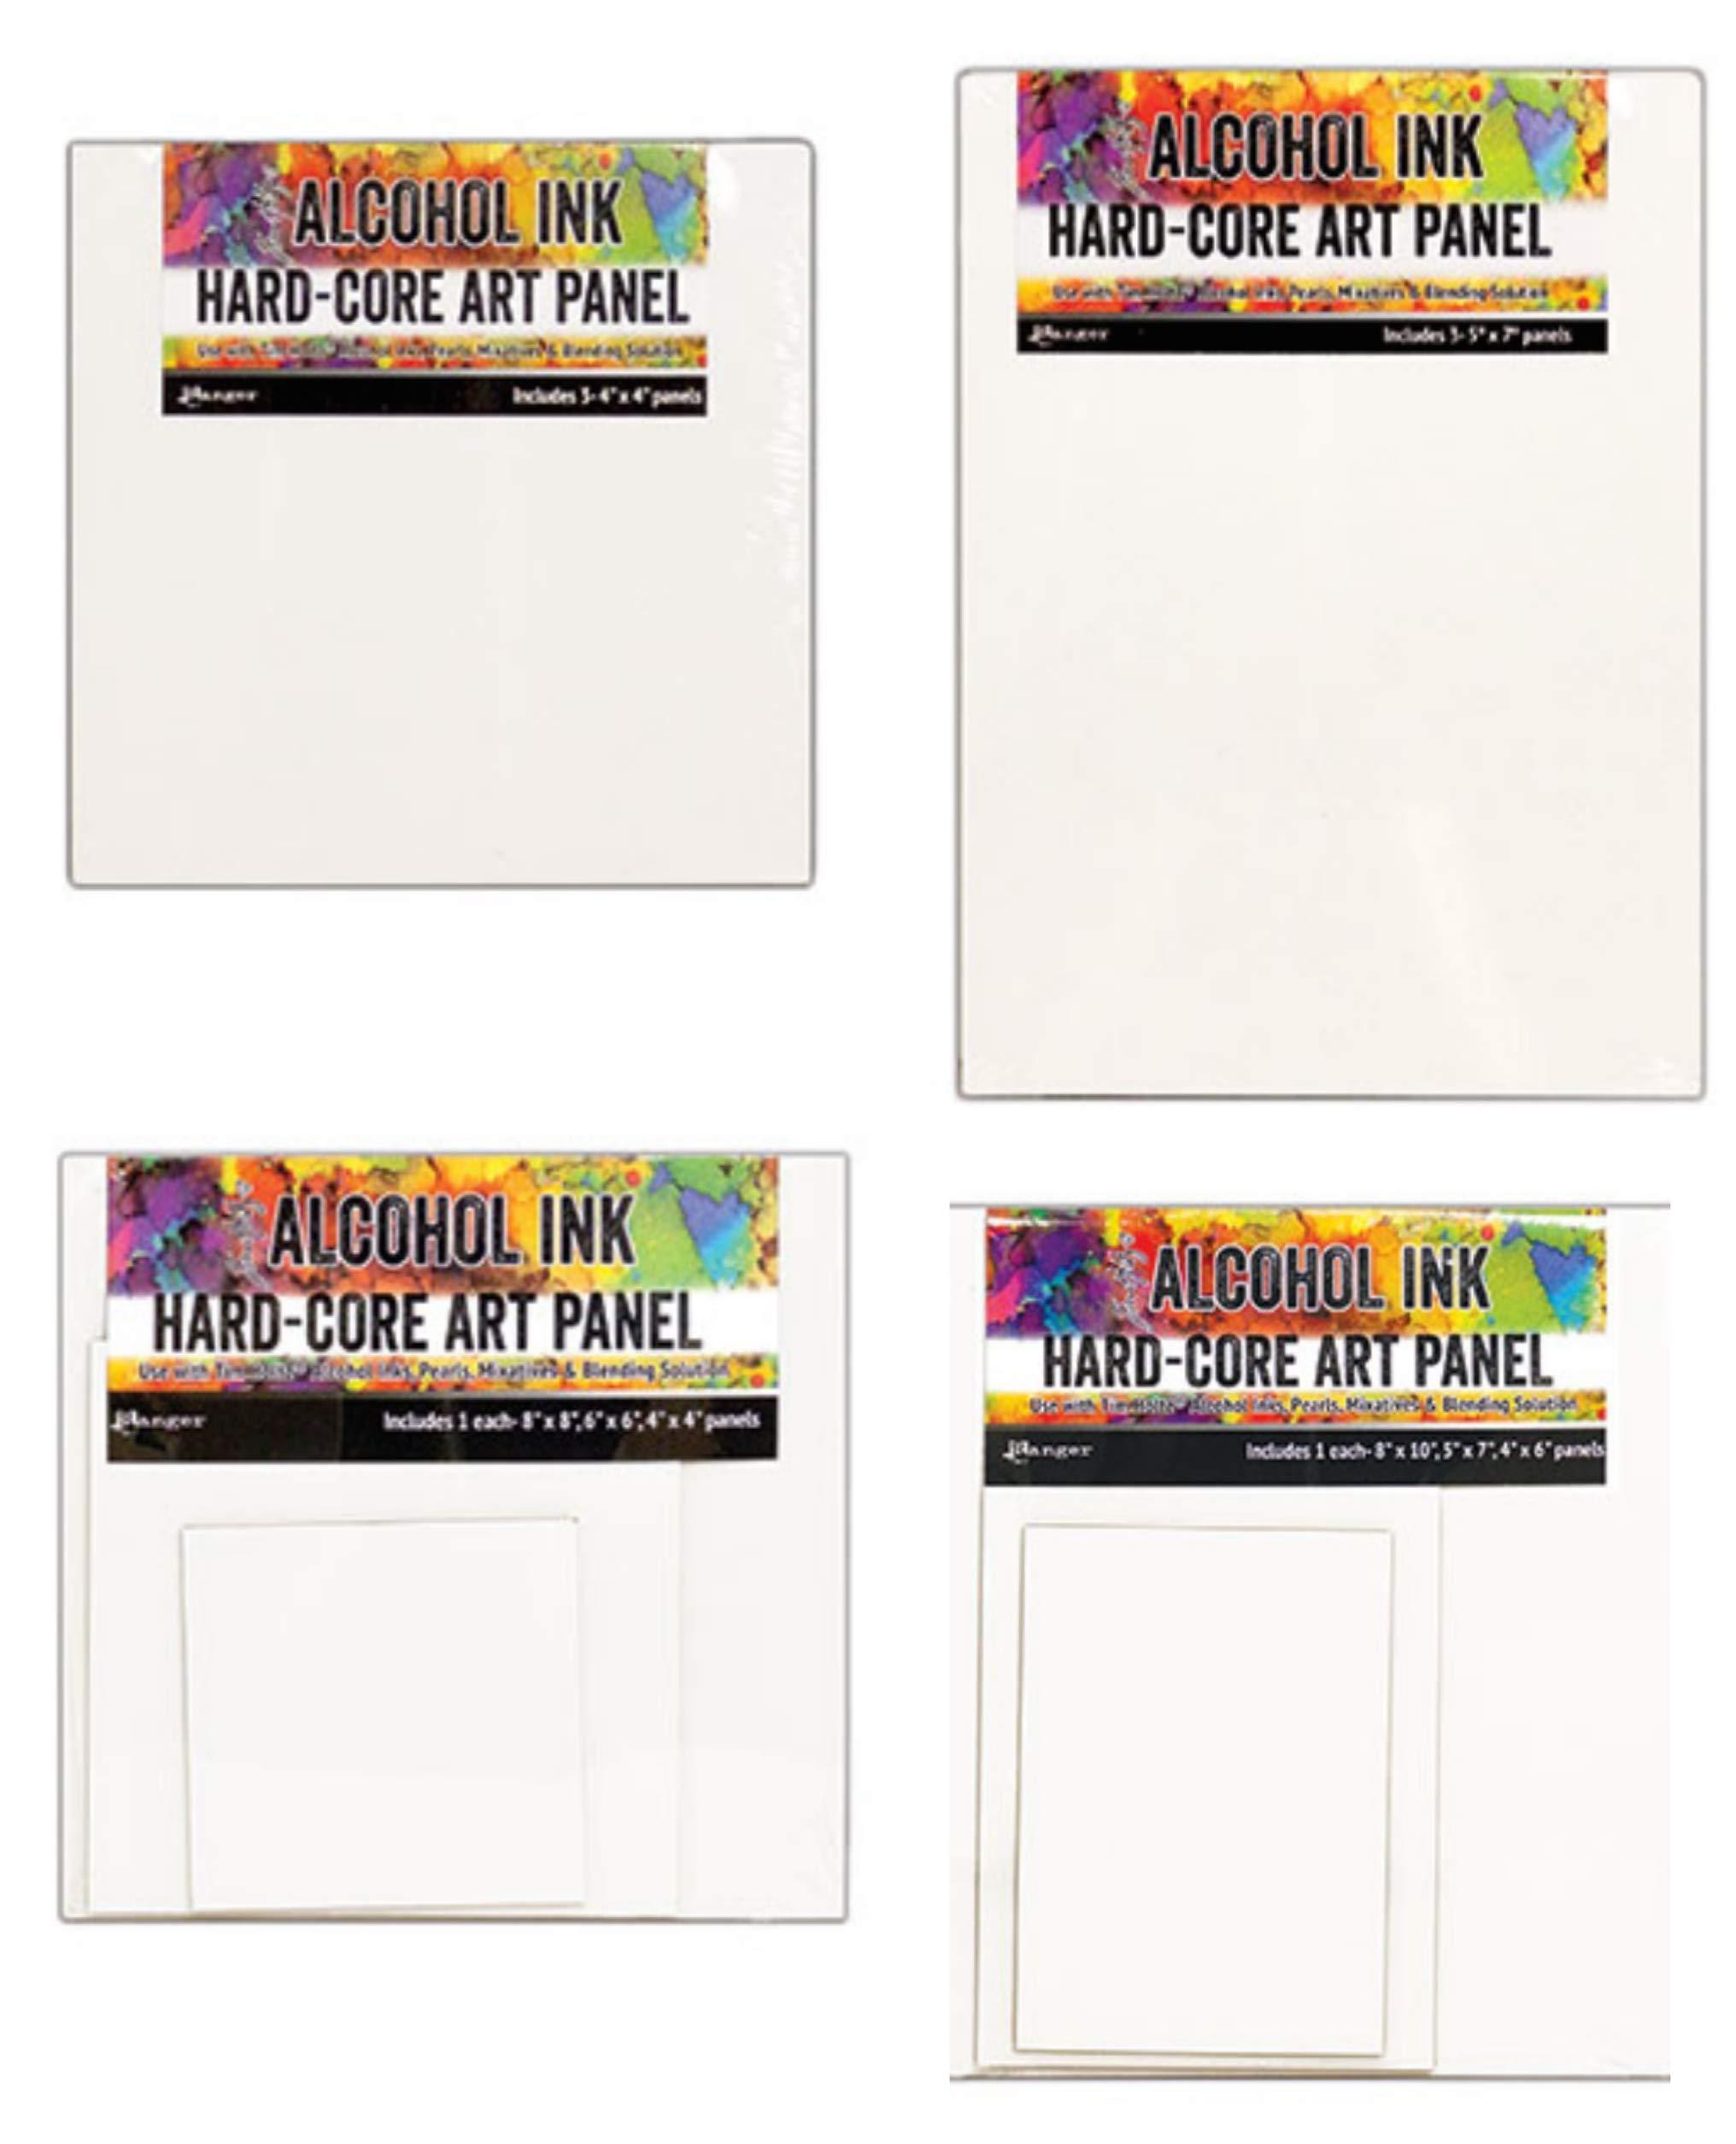 Tim Holtz Alcohol Ink Artists Hard-core Art Panels - Bundle of 12 Pieces, Various Sizes